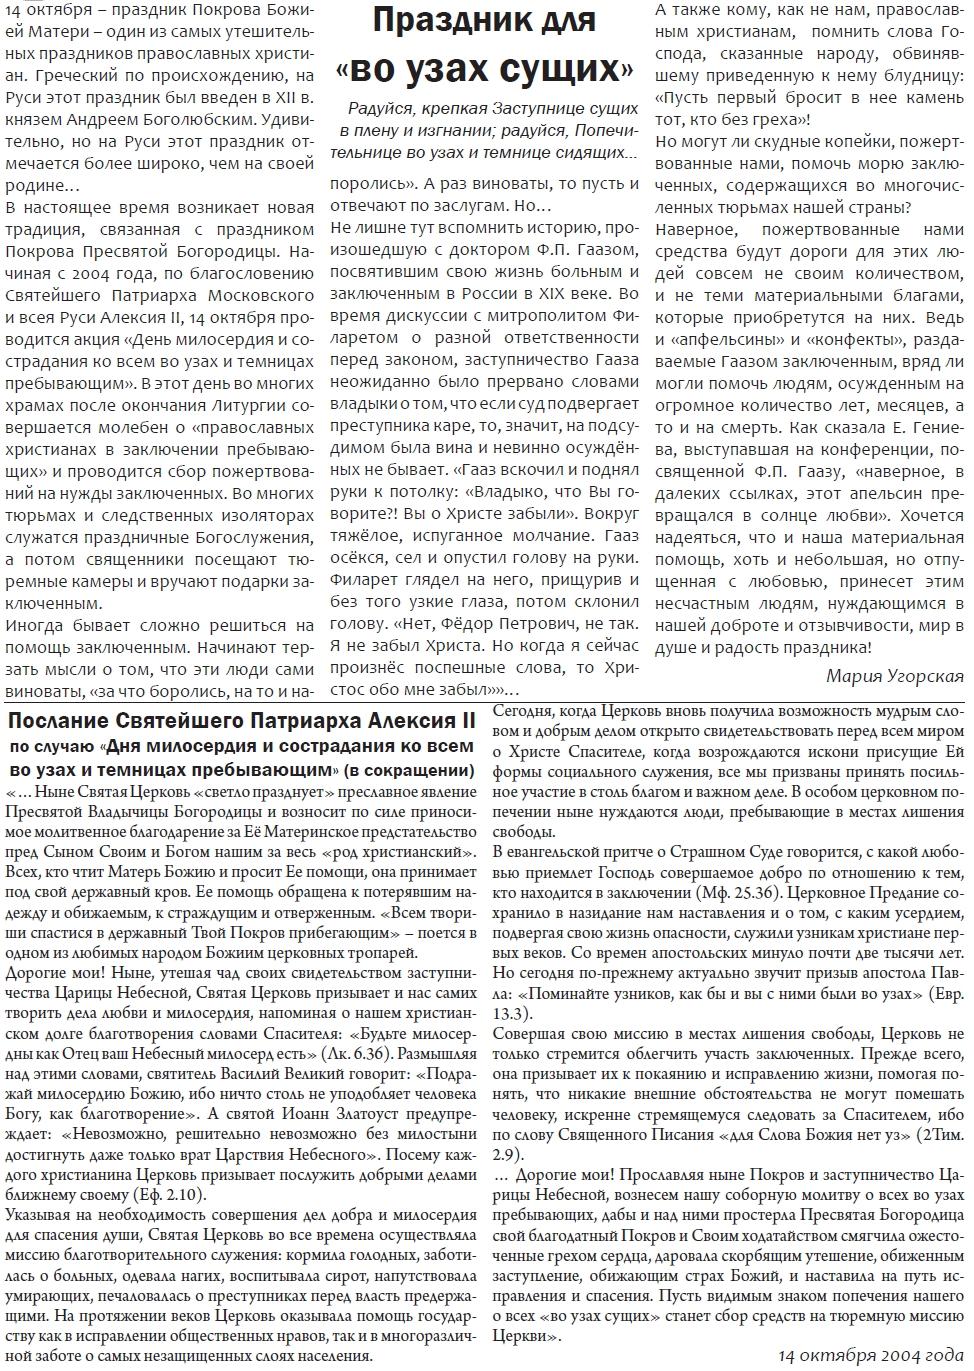 стр 4-2